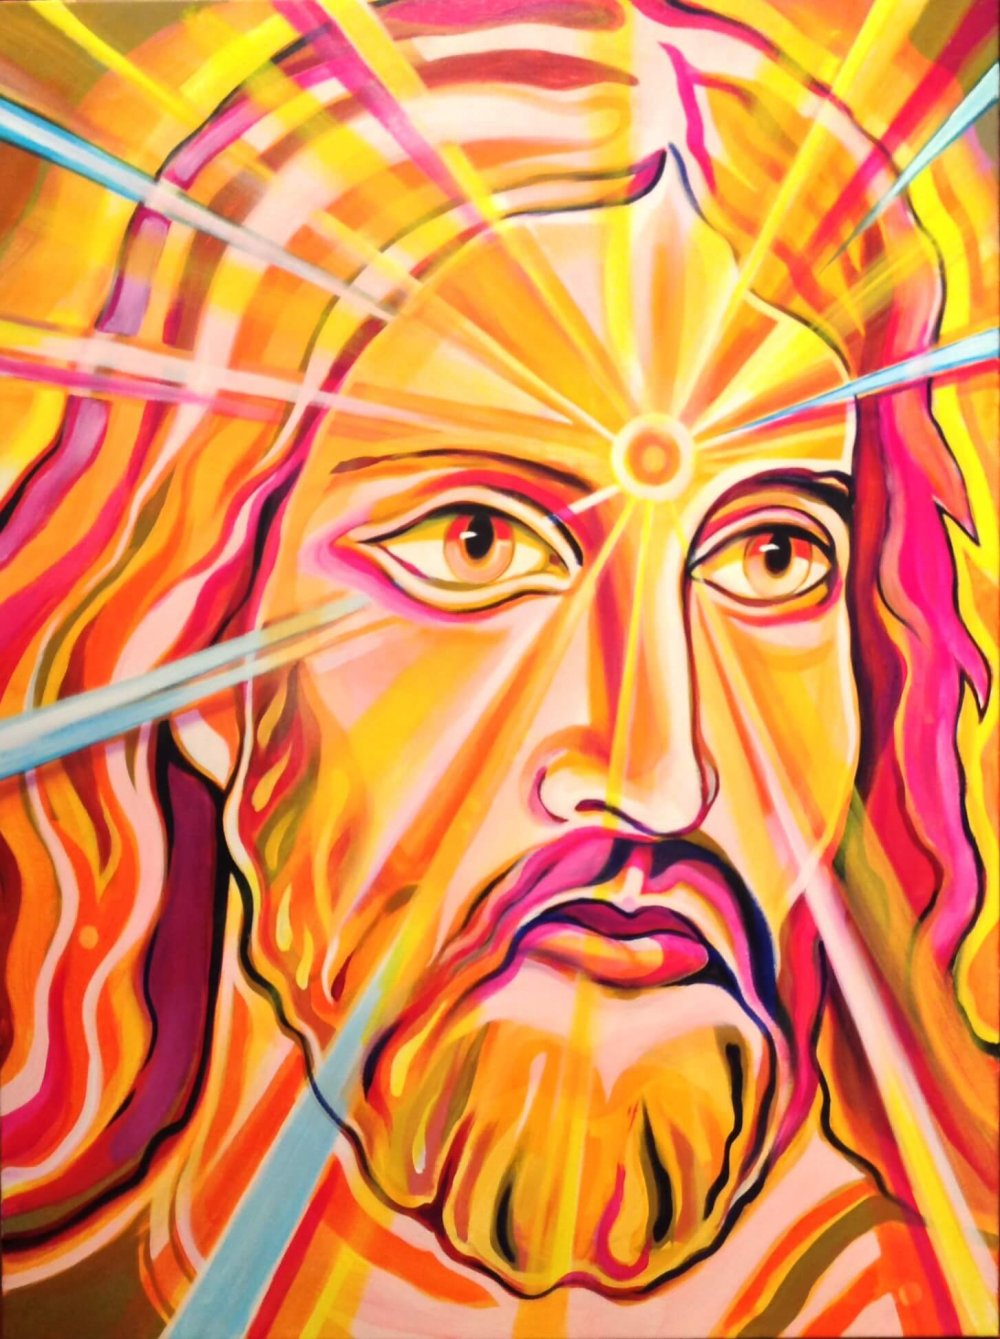 Jesu of Rays (GICLEE) - Posters - Markus Ray Art